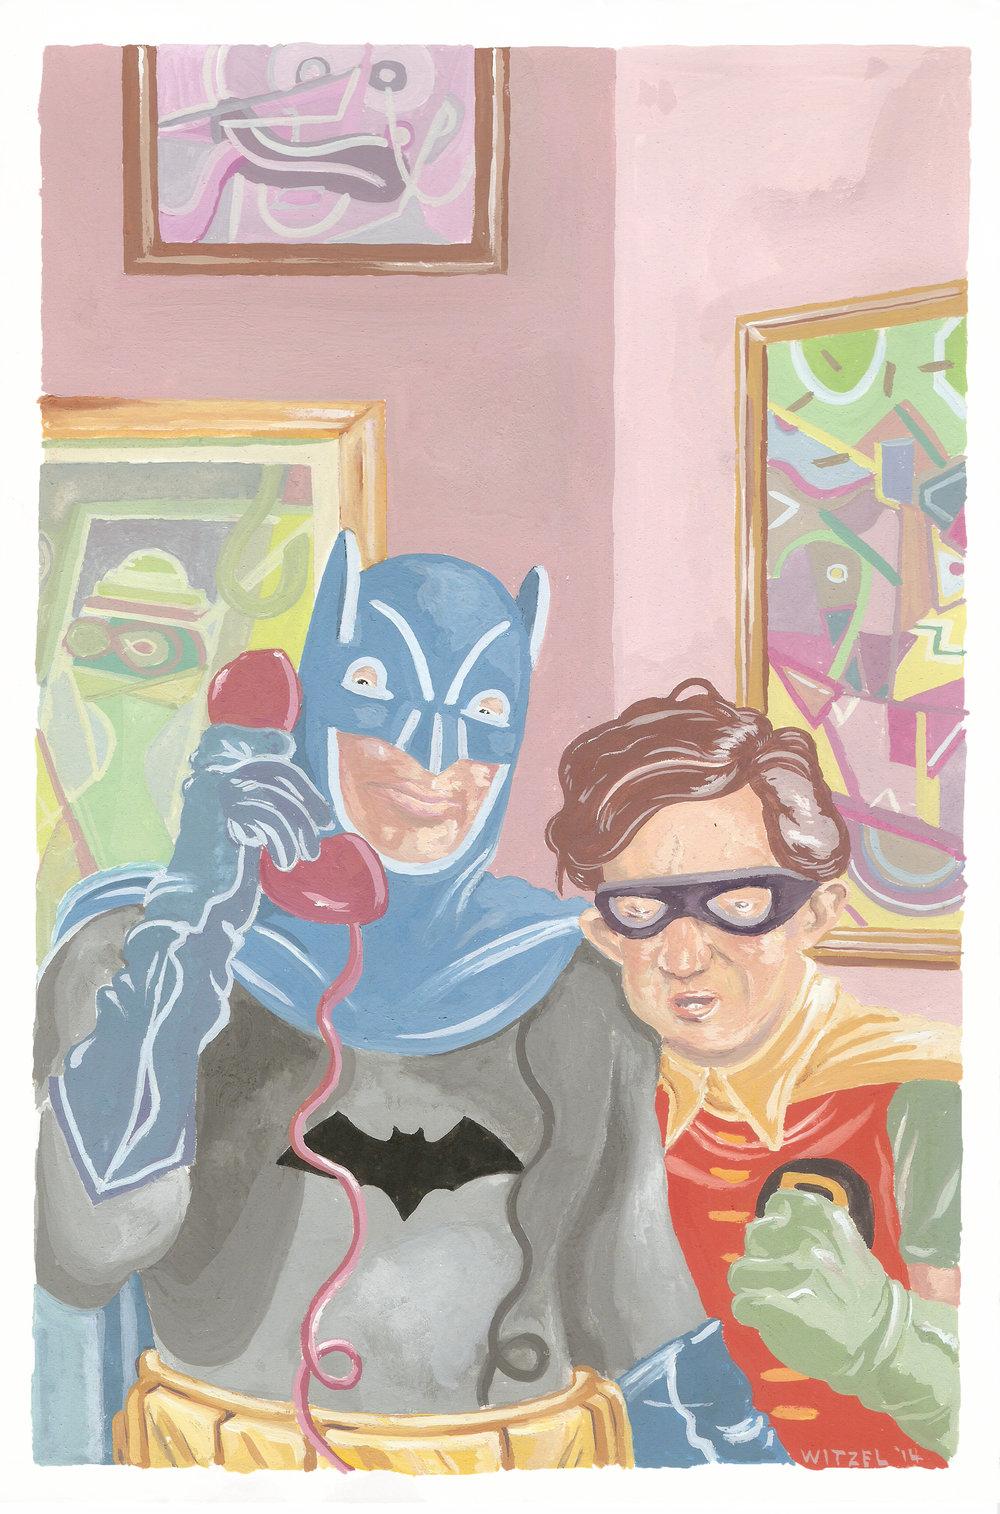 The Wayne Collection: Batman's Bid